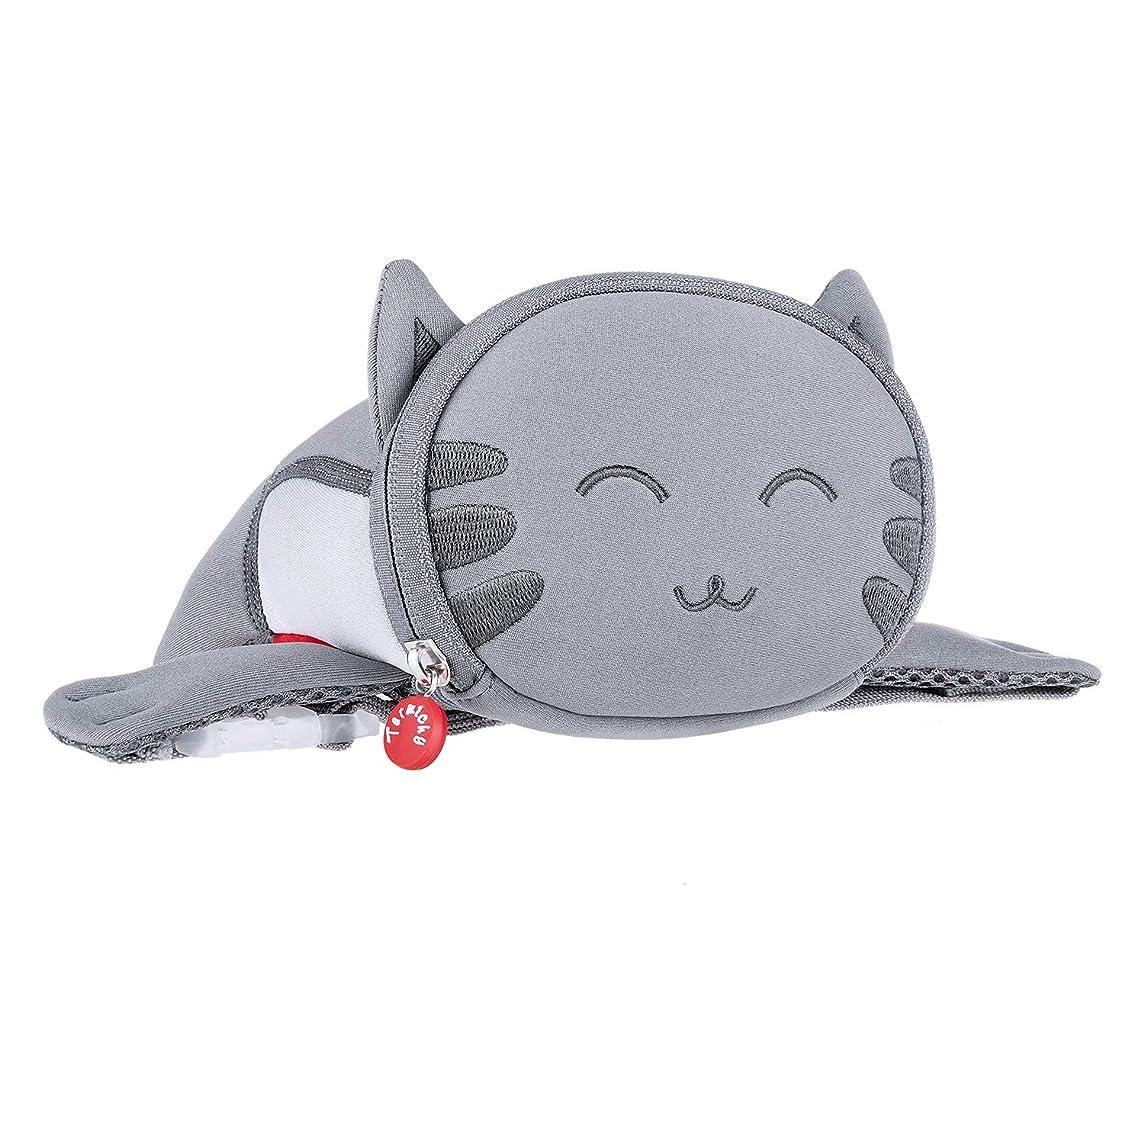 Kids Travel Waist Purse, Termichy Cute 3D Cartoon Cat Animal Fanny Pack Bag For Babies Girls Toddler Children Sport Running Camping Trip Makeup Masquerade Toy(Kitty)